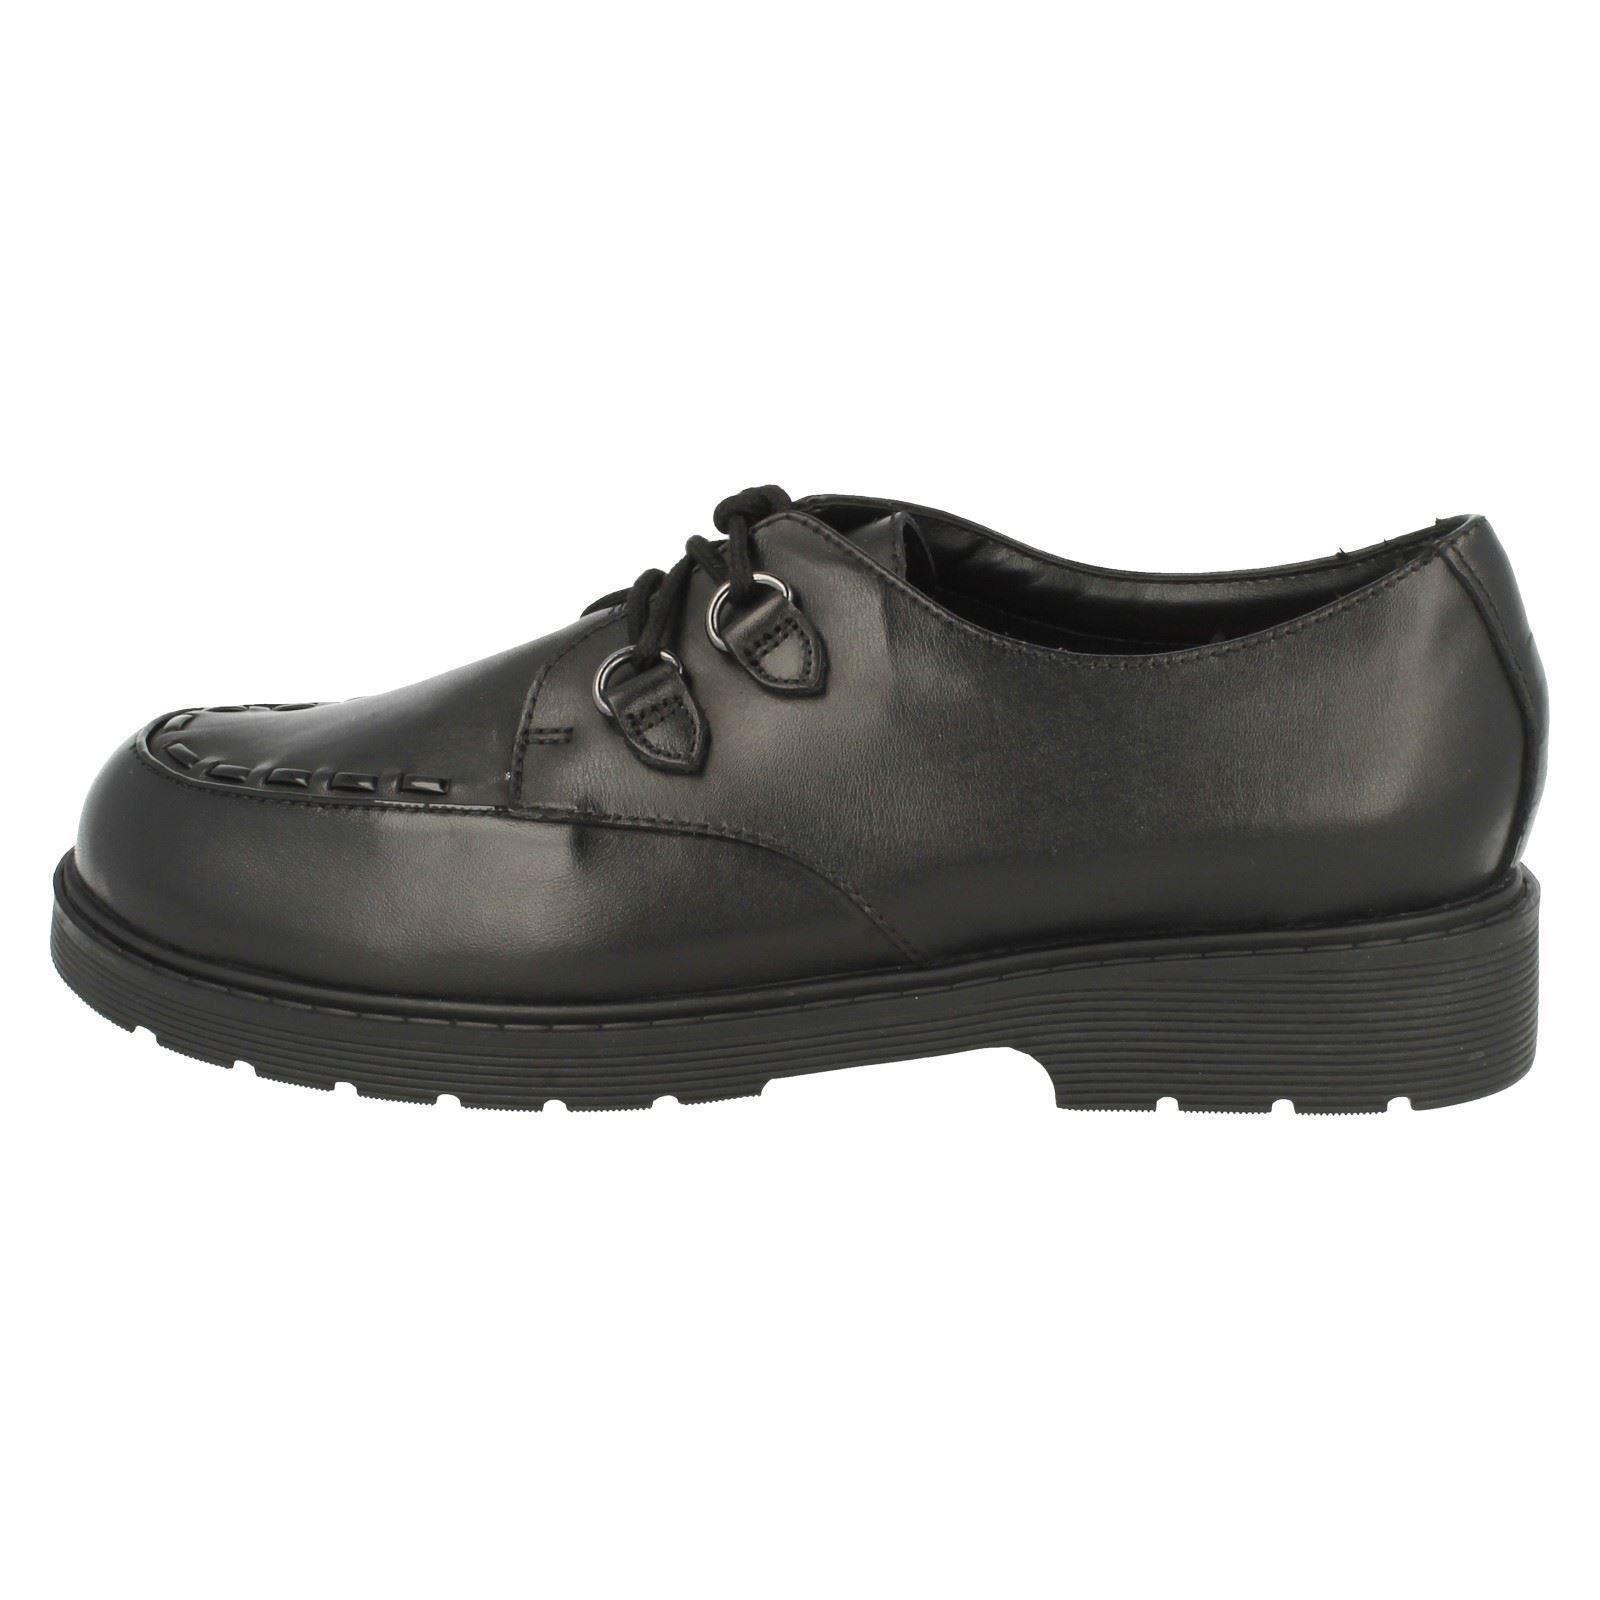 Up mayores School Shoes By Clarks Bootleg Purley Jo Lace Niñas Black wSxdqXfXY